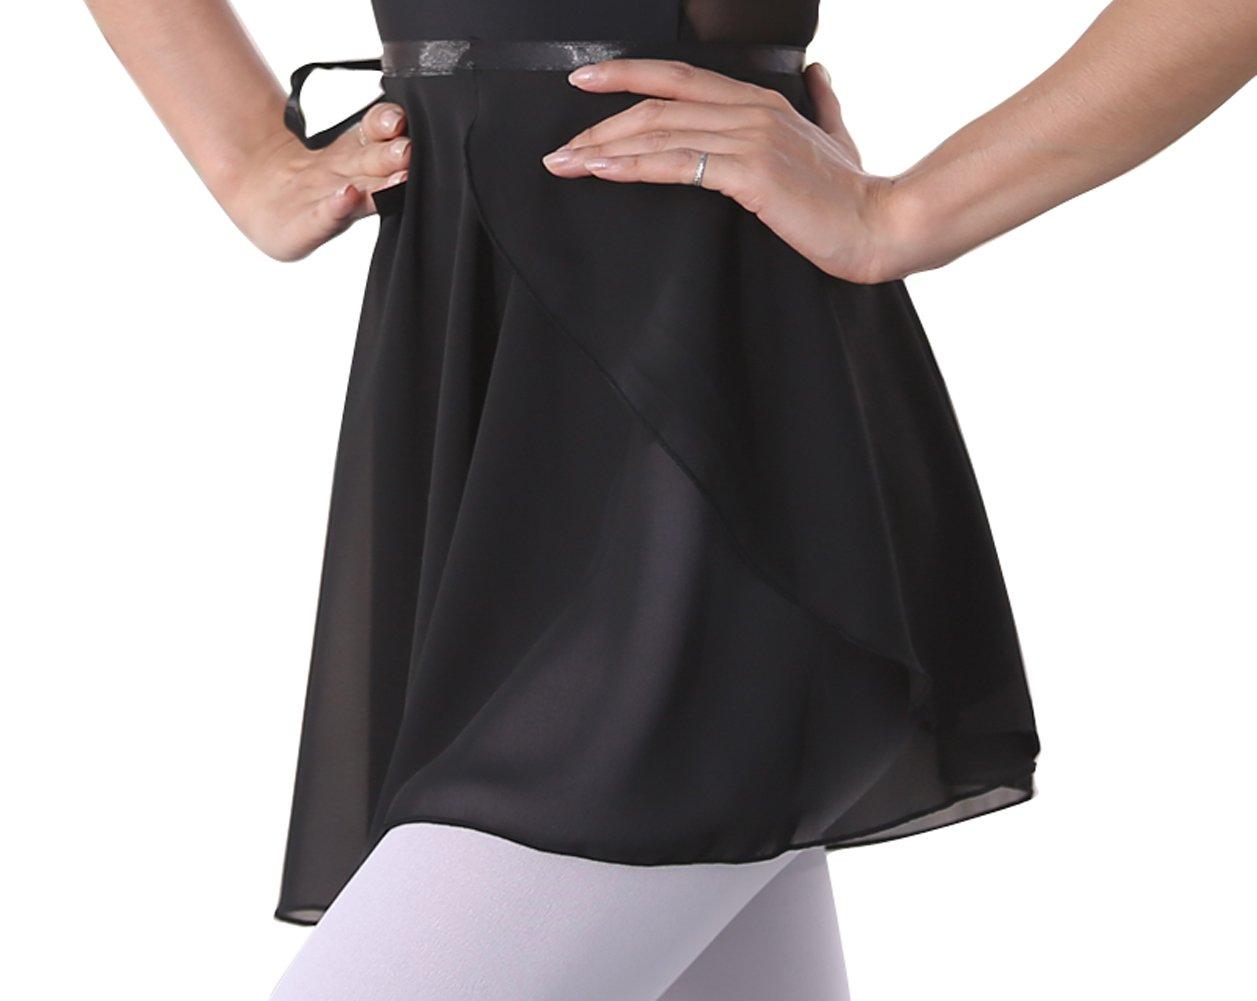 woosun Adult Ladies Ballet Wrap Over Scarf Dance Leotard Skate Tutu Skirt Chiffon 38cm (Black)